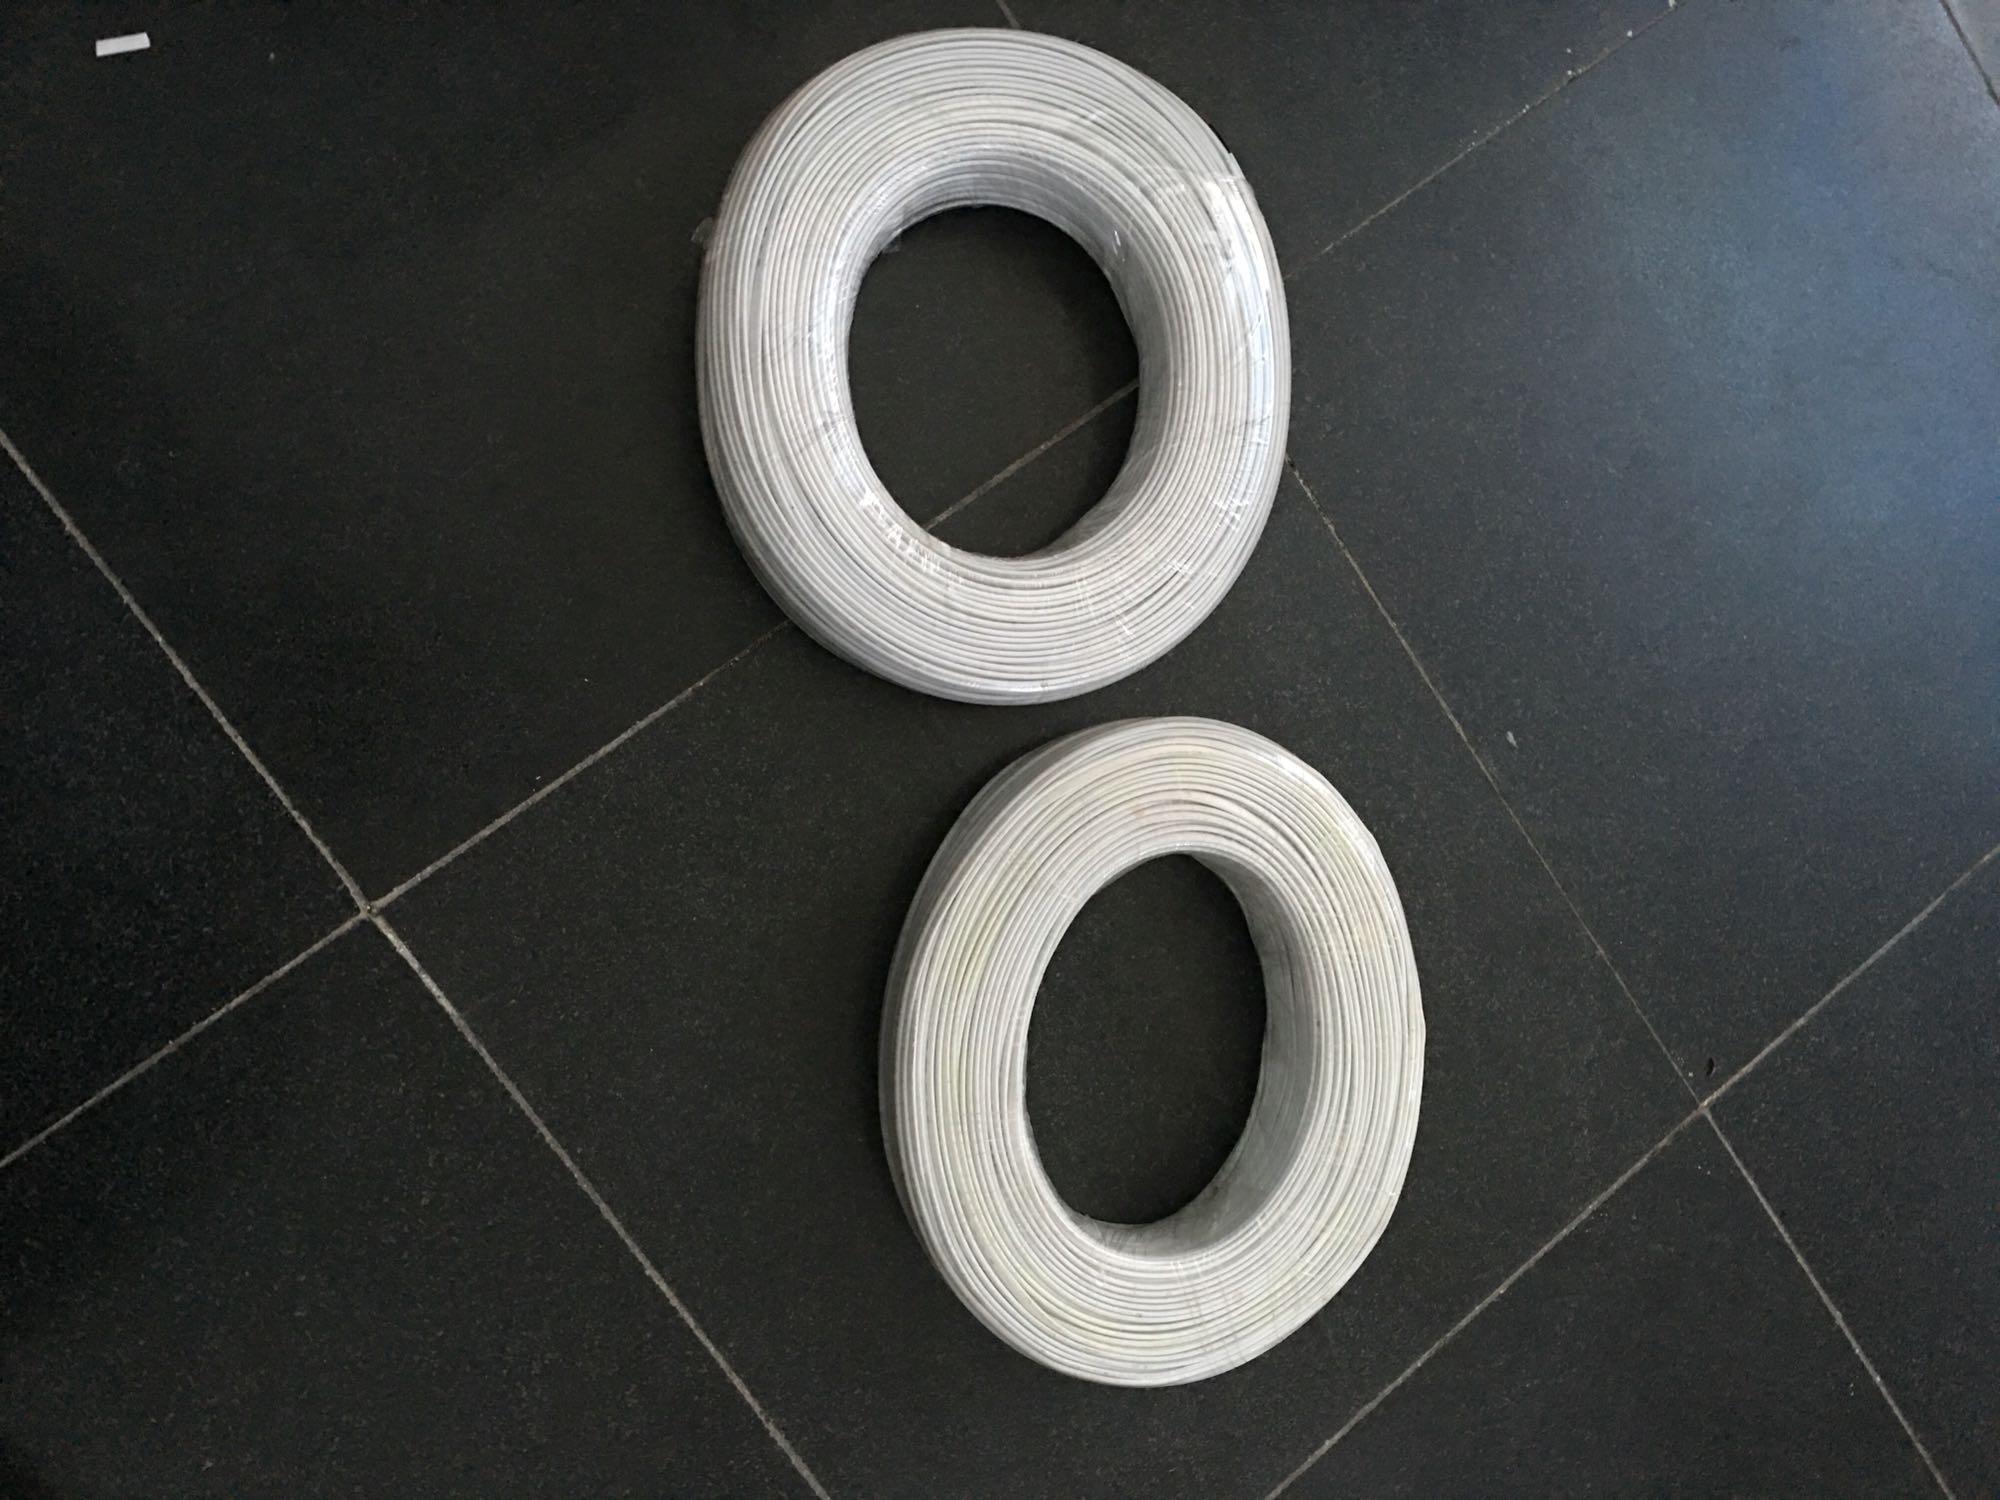 nike tennis shoes for men with toe wear warranty deed 00248213 outletonlineshop